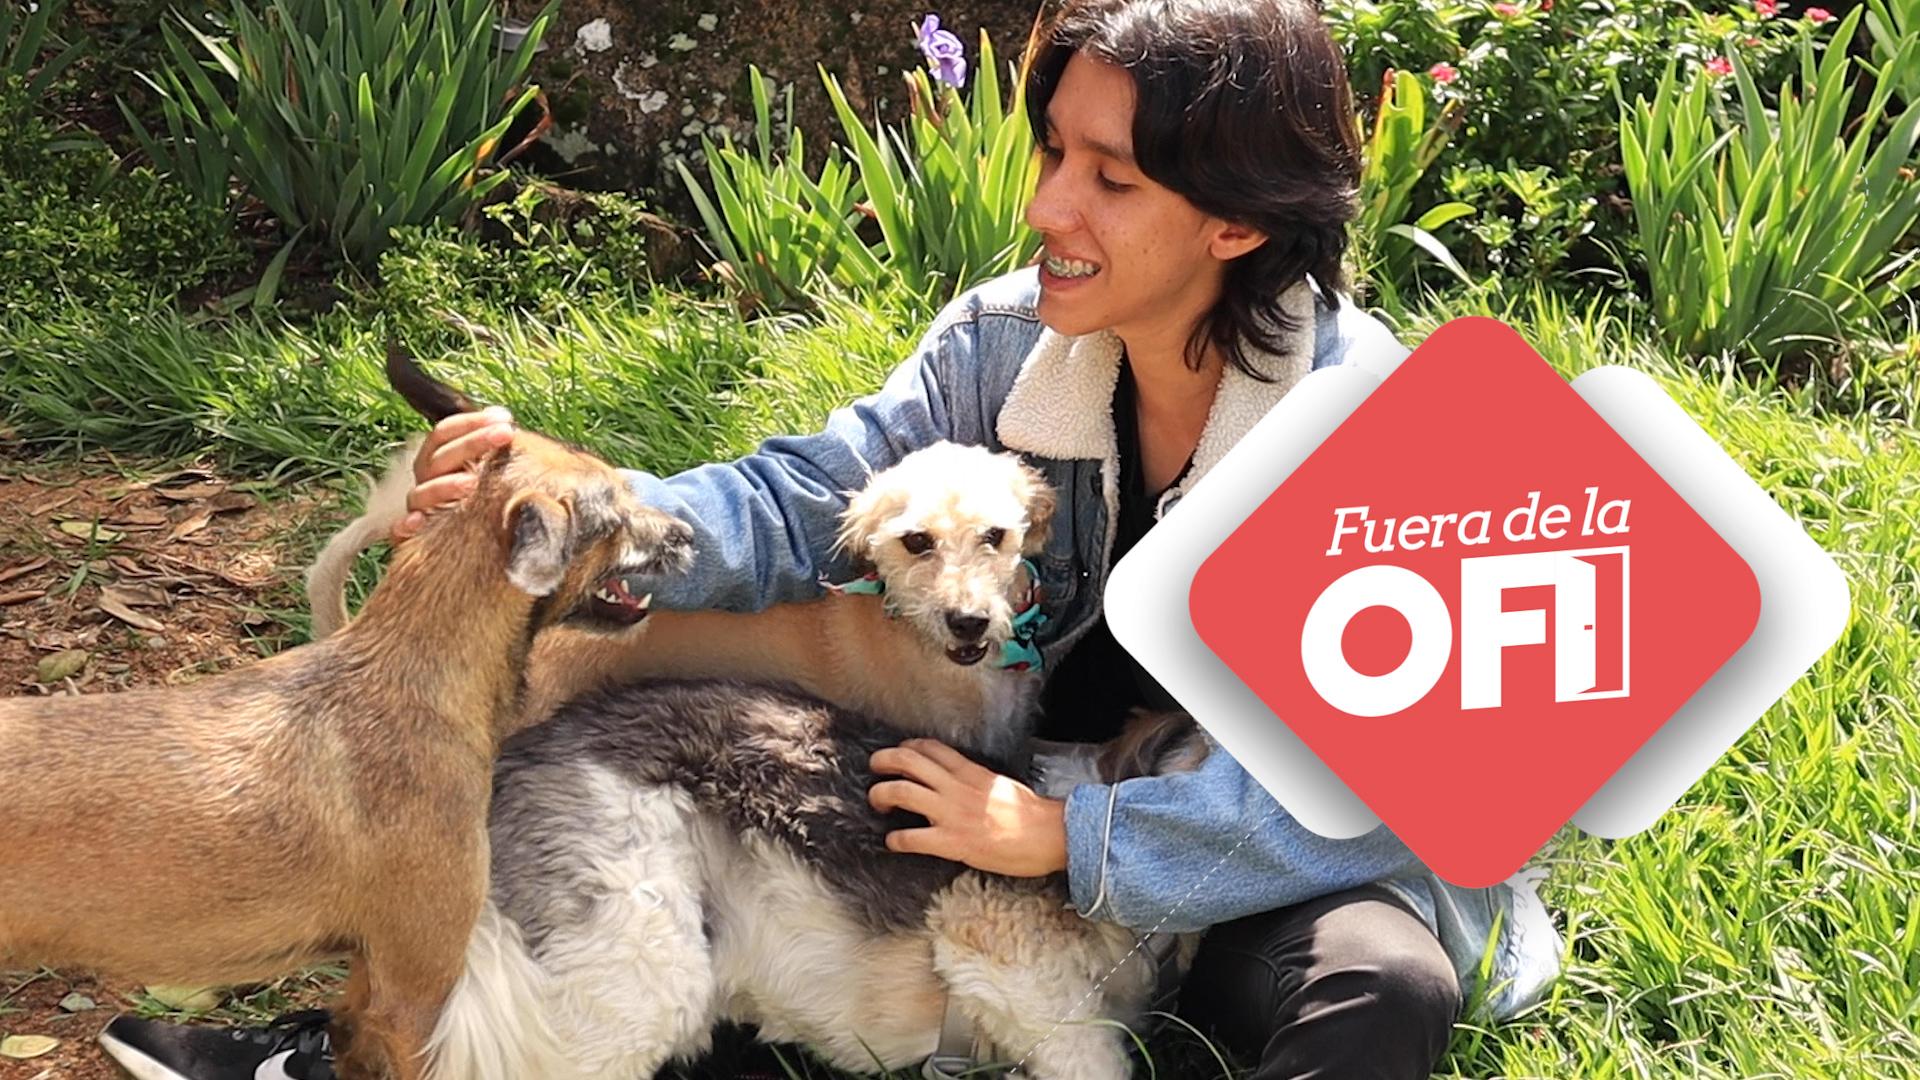 Fuera de la ofi Joan rescata perritos callejeros